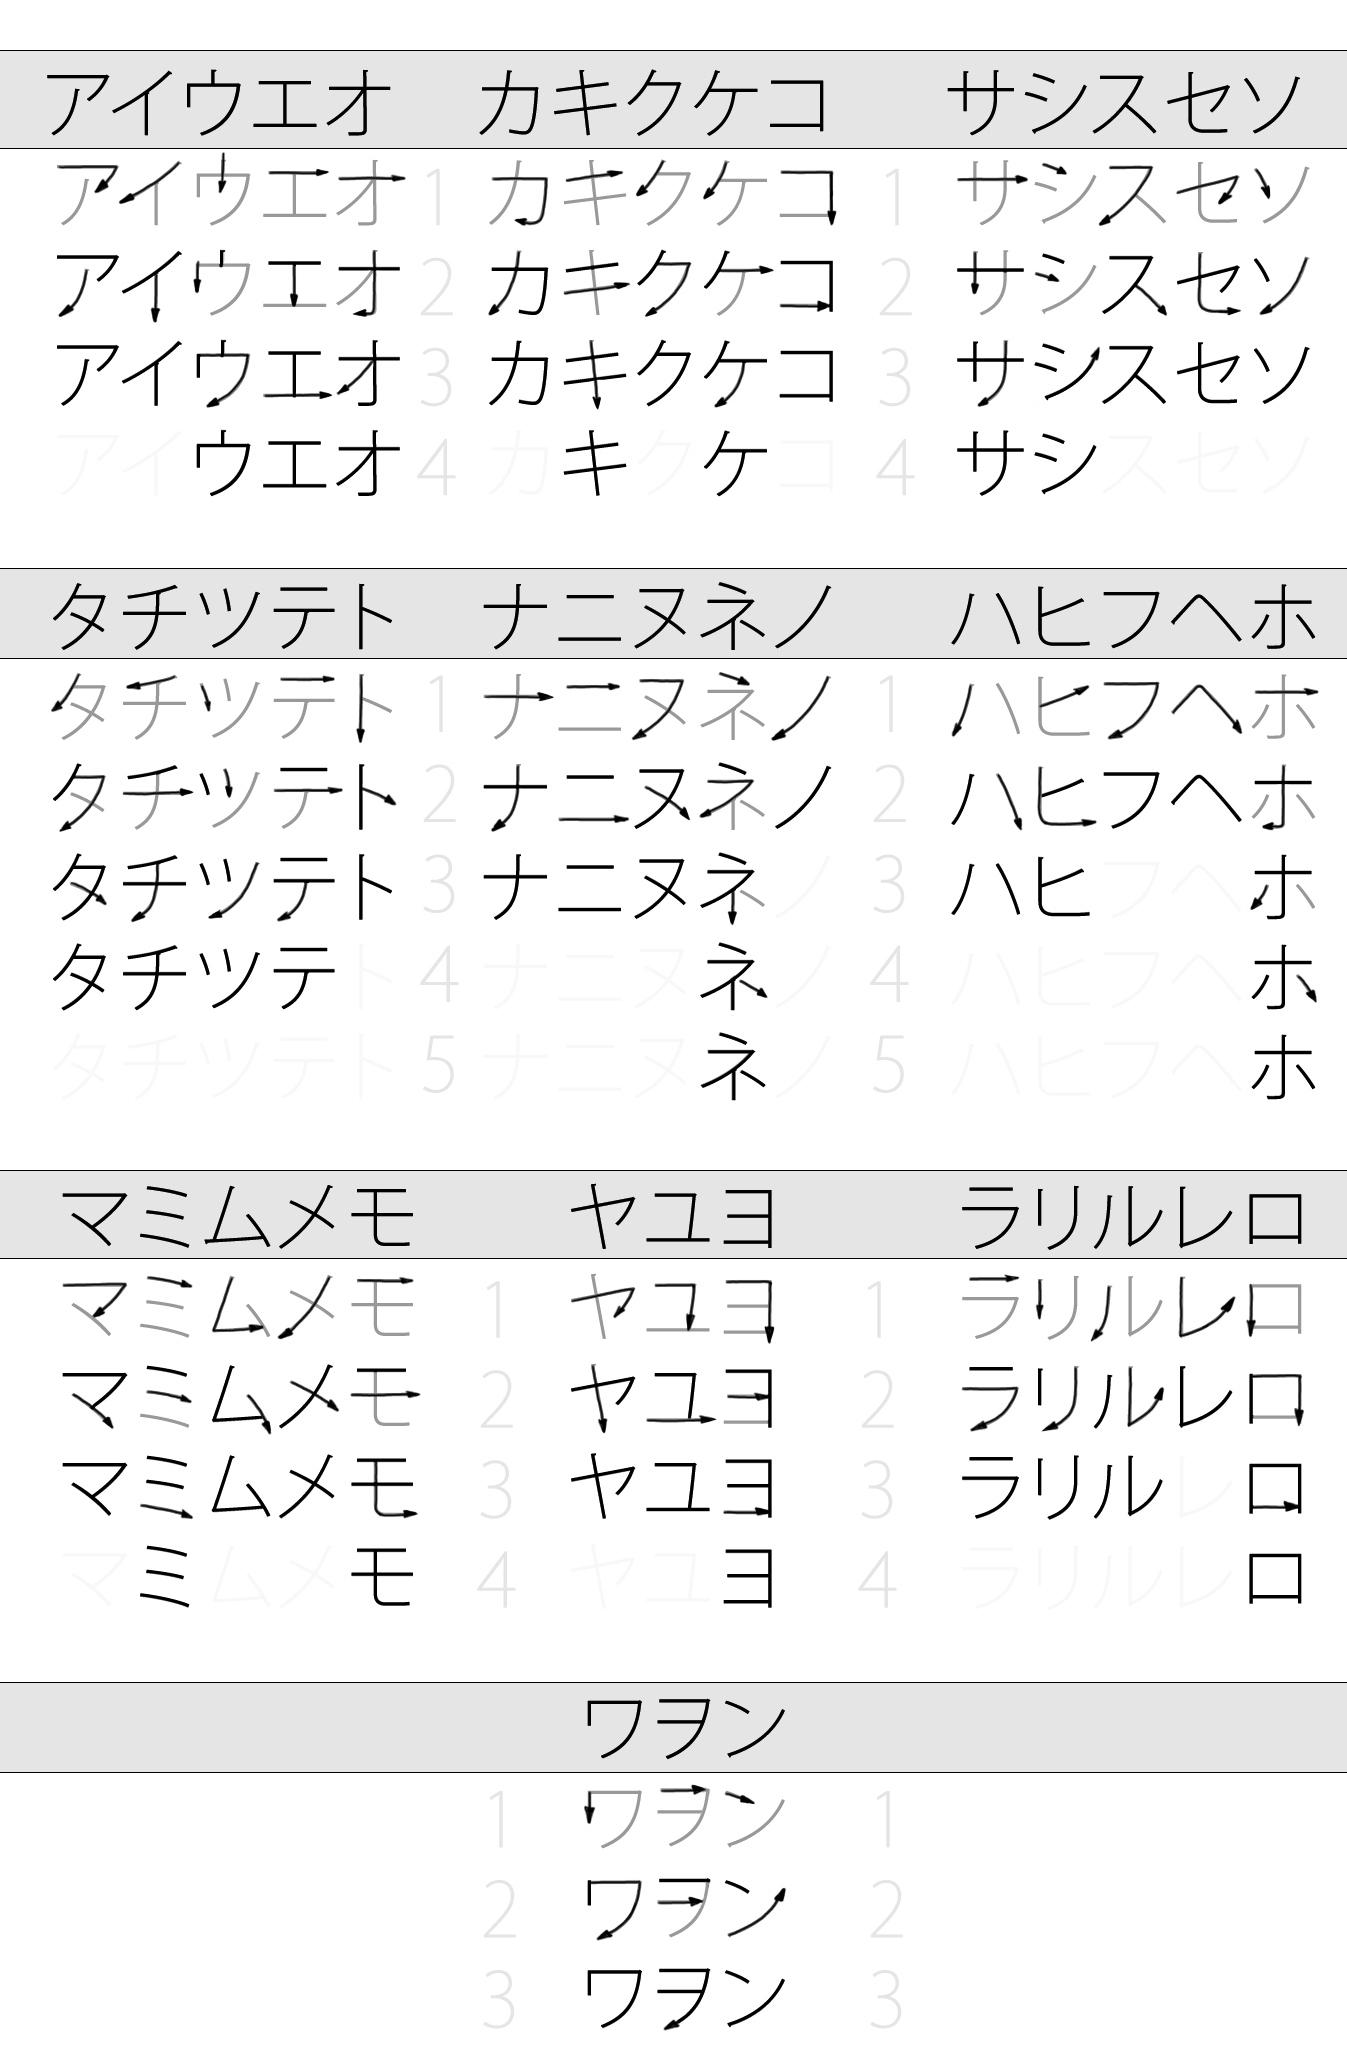 Counter For Digital Images Japanese Grammar